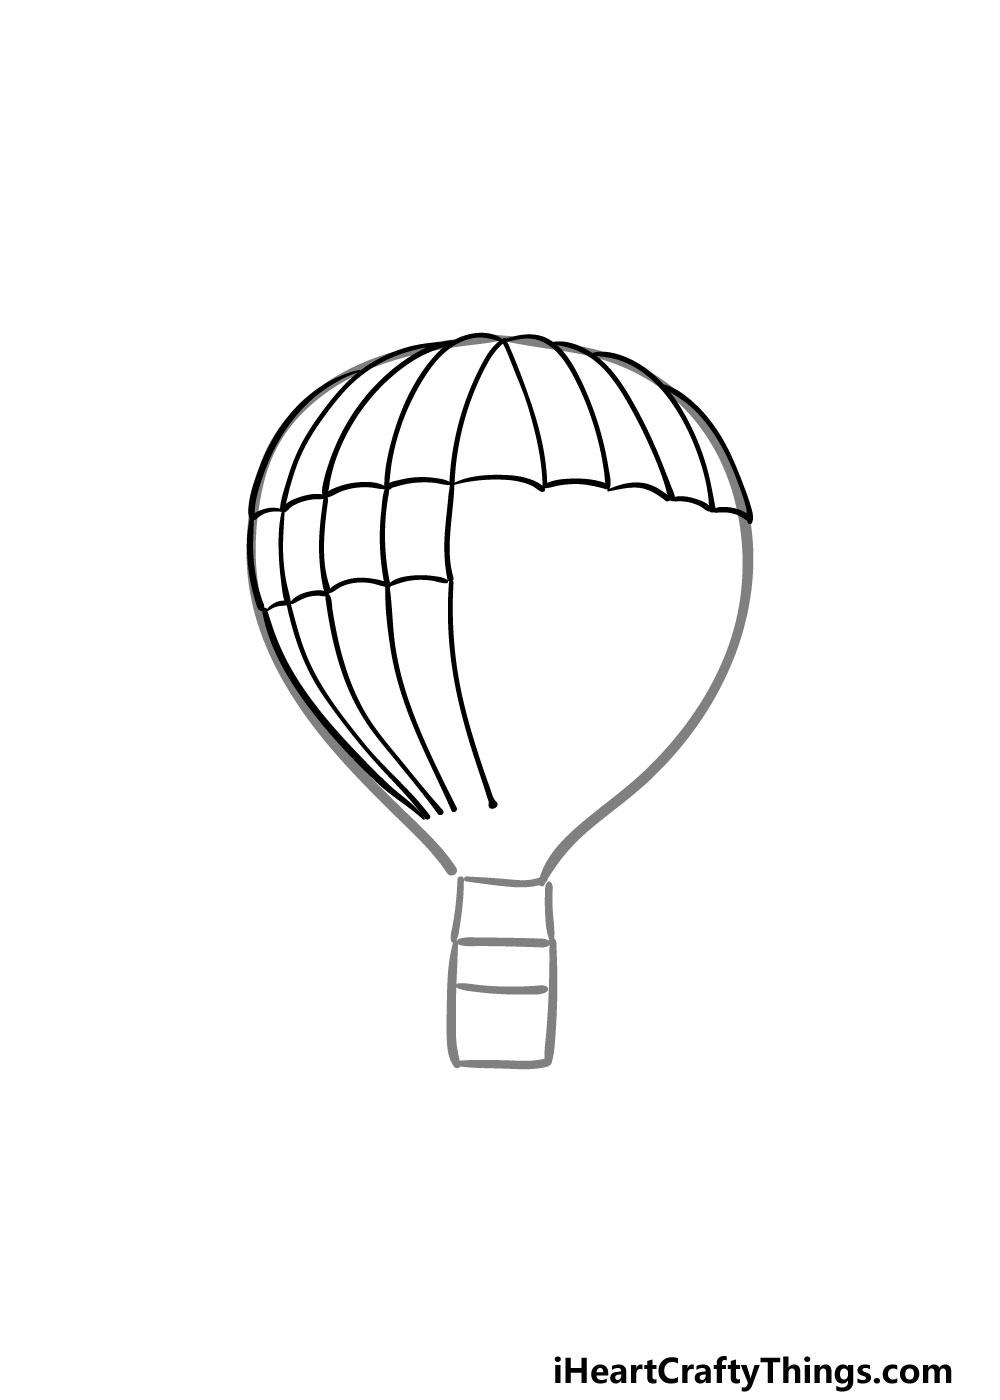 drawing a hot air balloon step 3